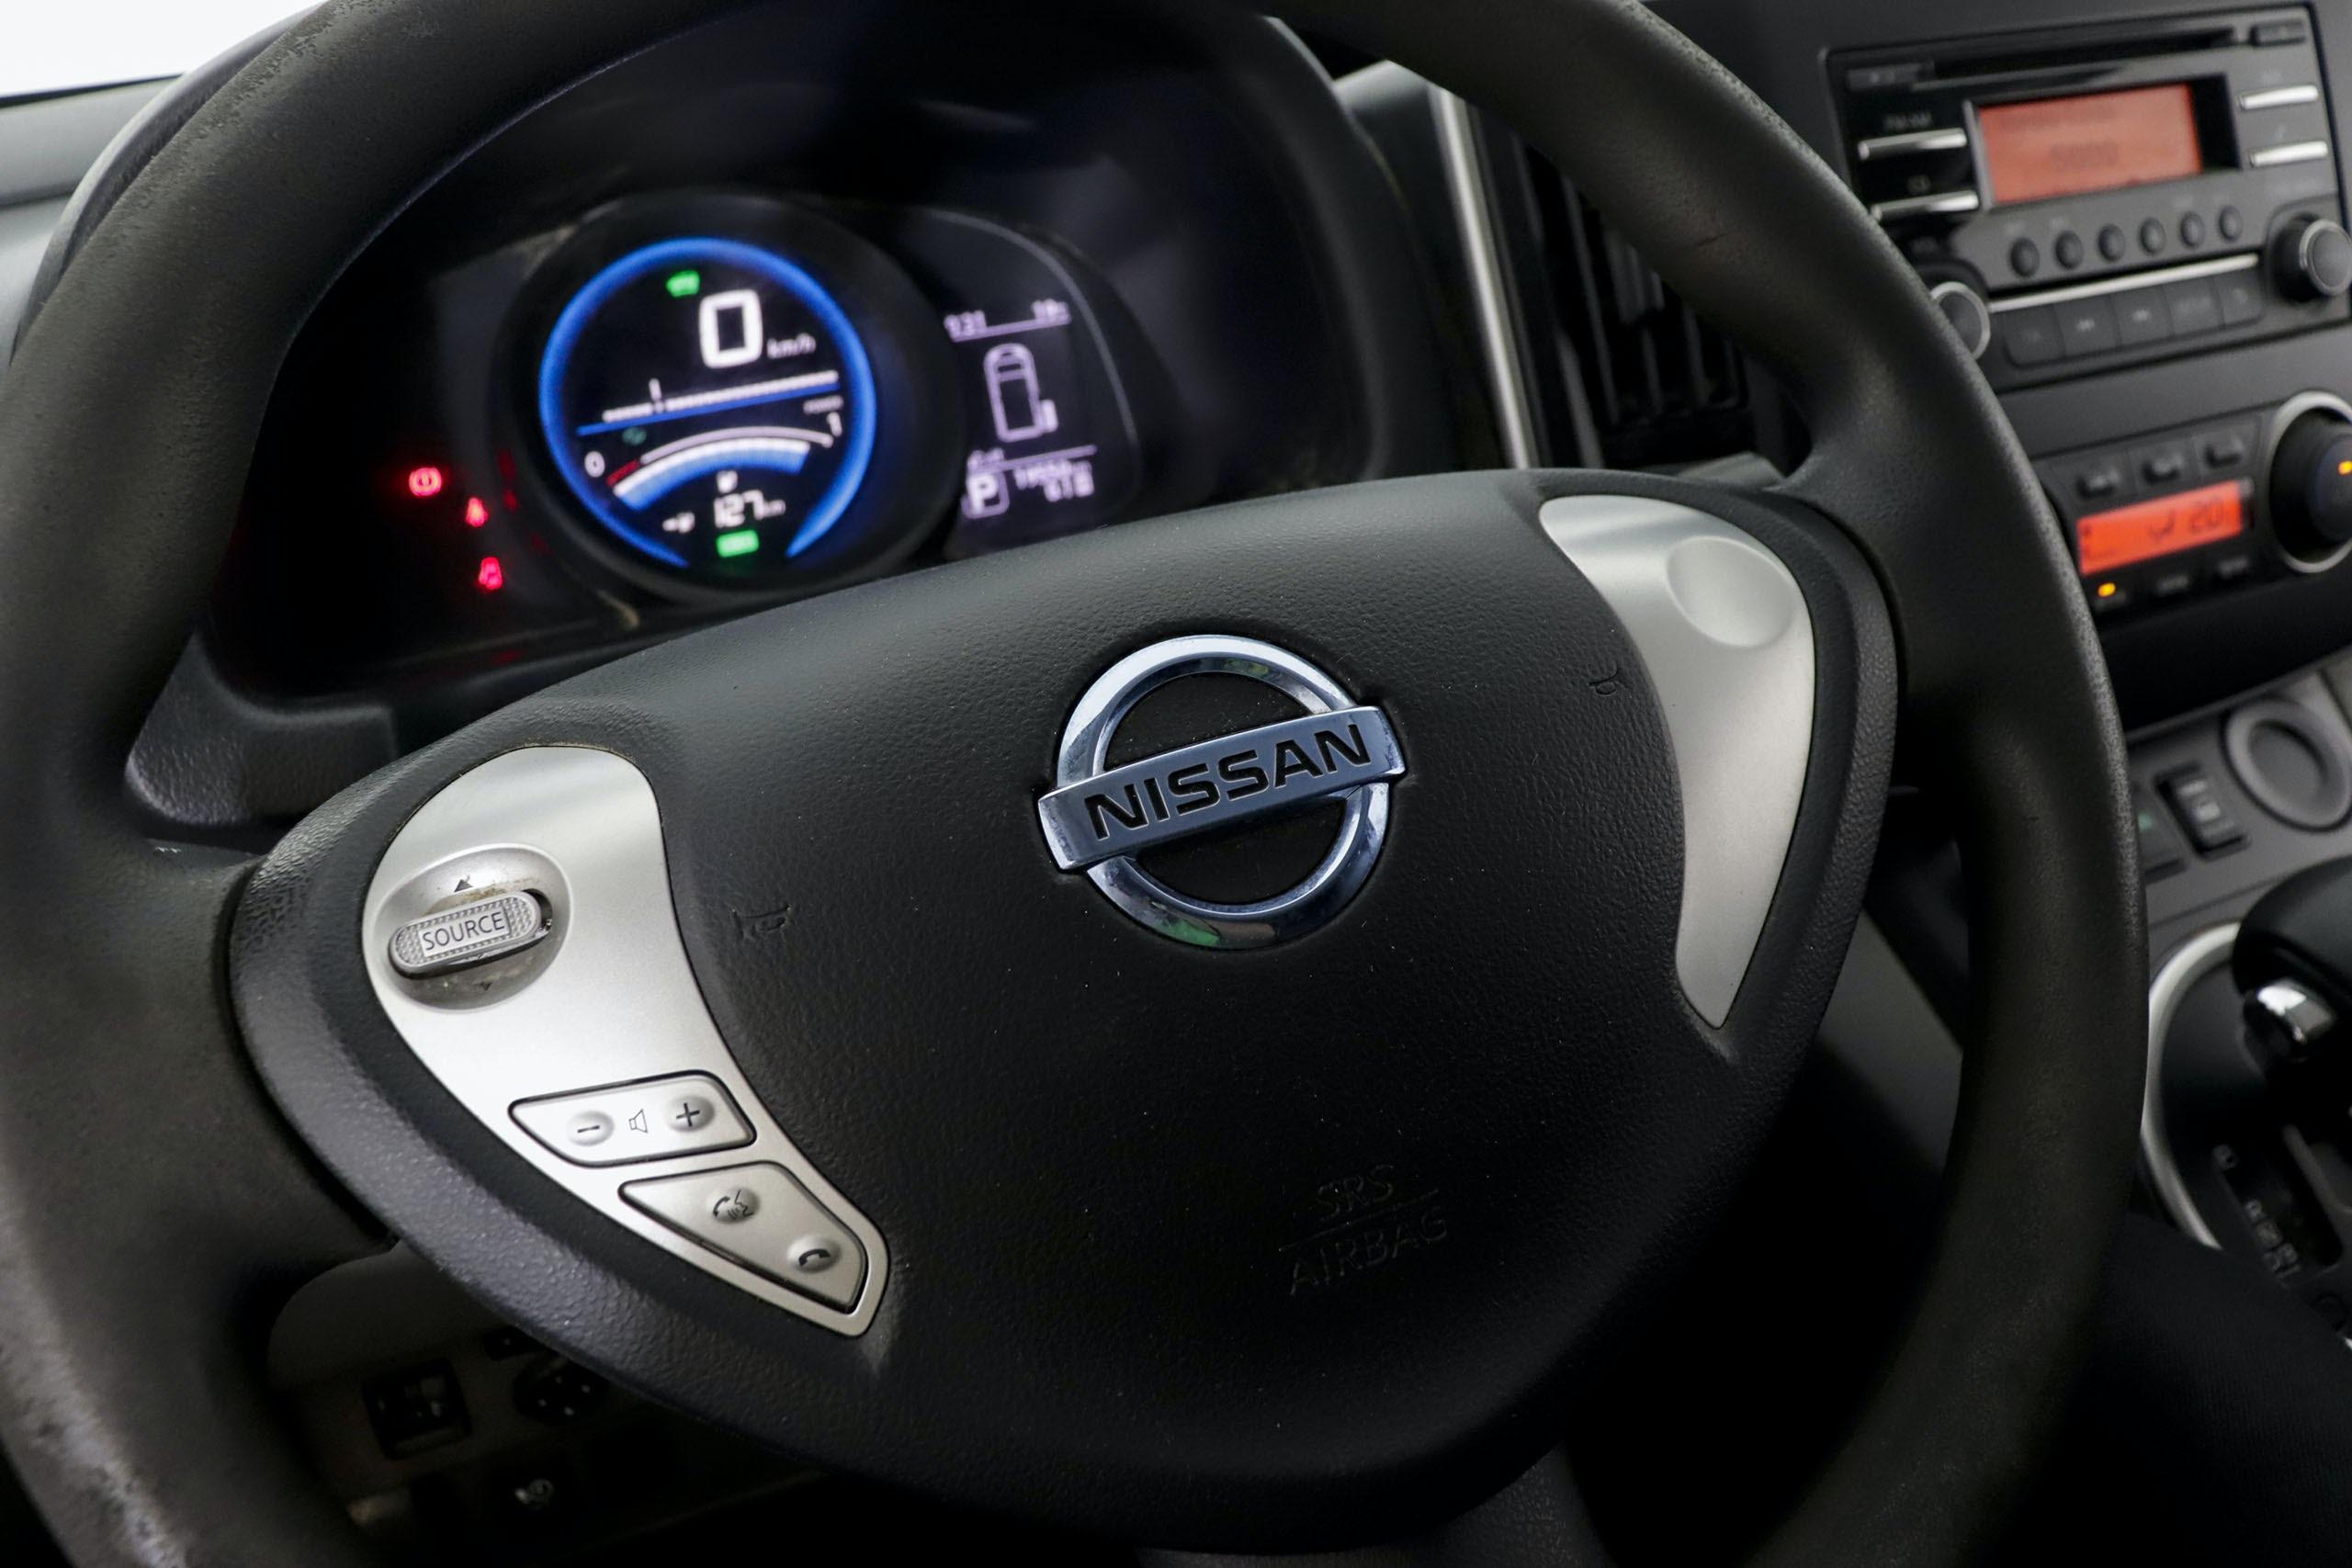 Nissan E-nv200 Combi5 110cv 5p Hybrid E5 Auto - Foto 20